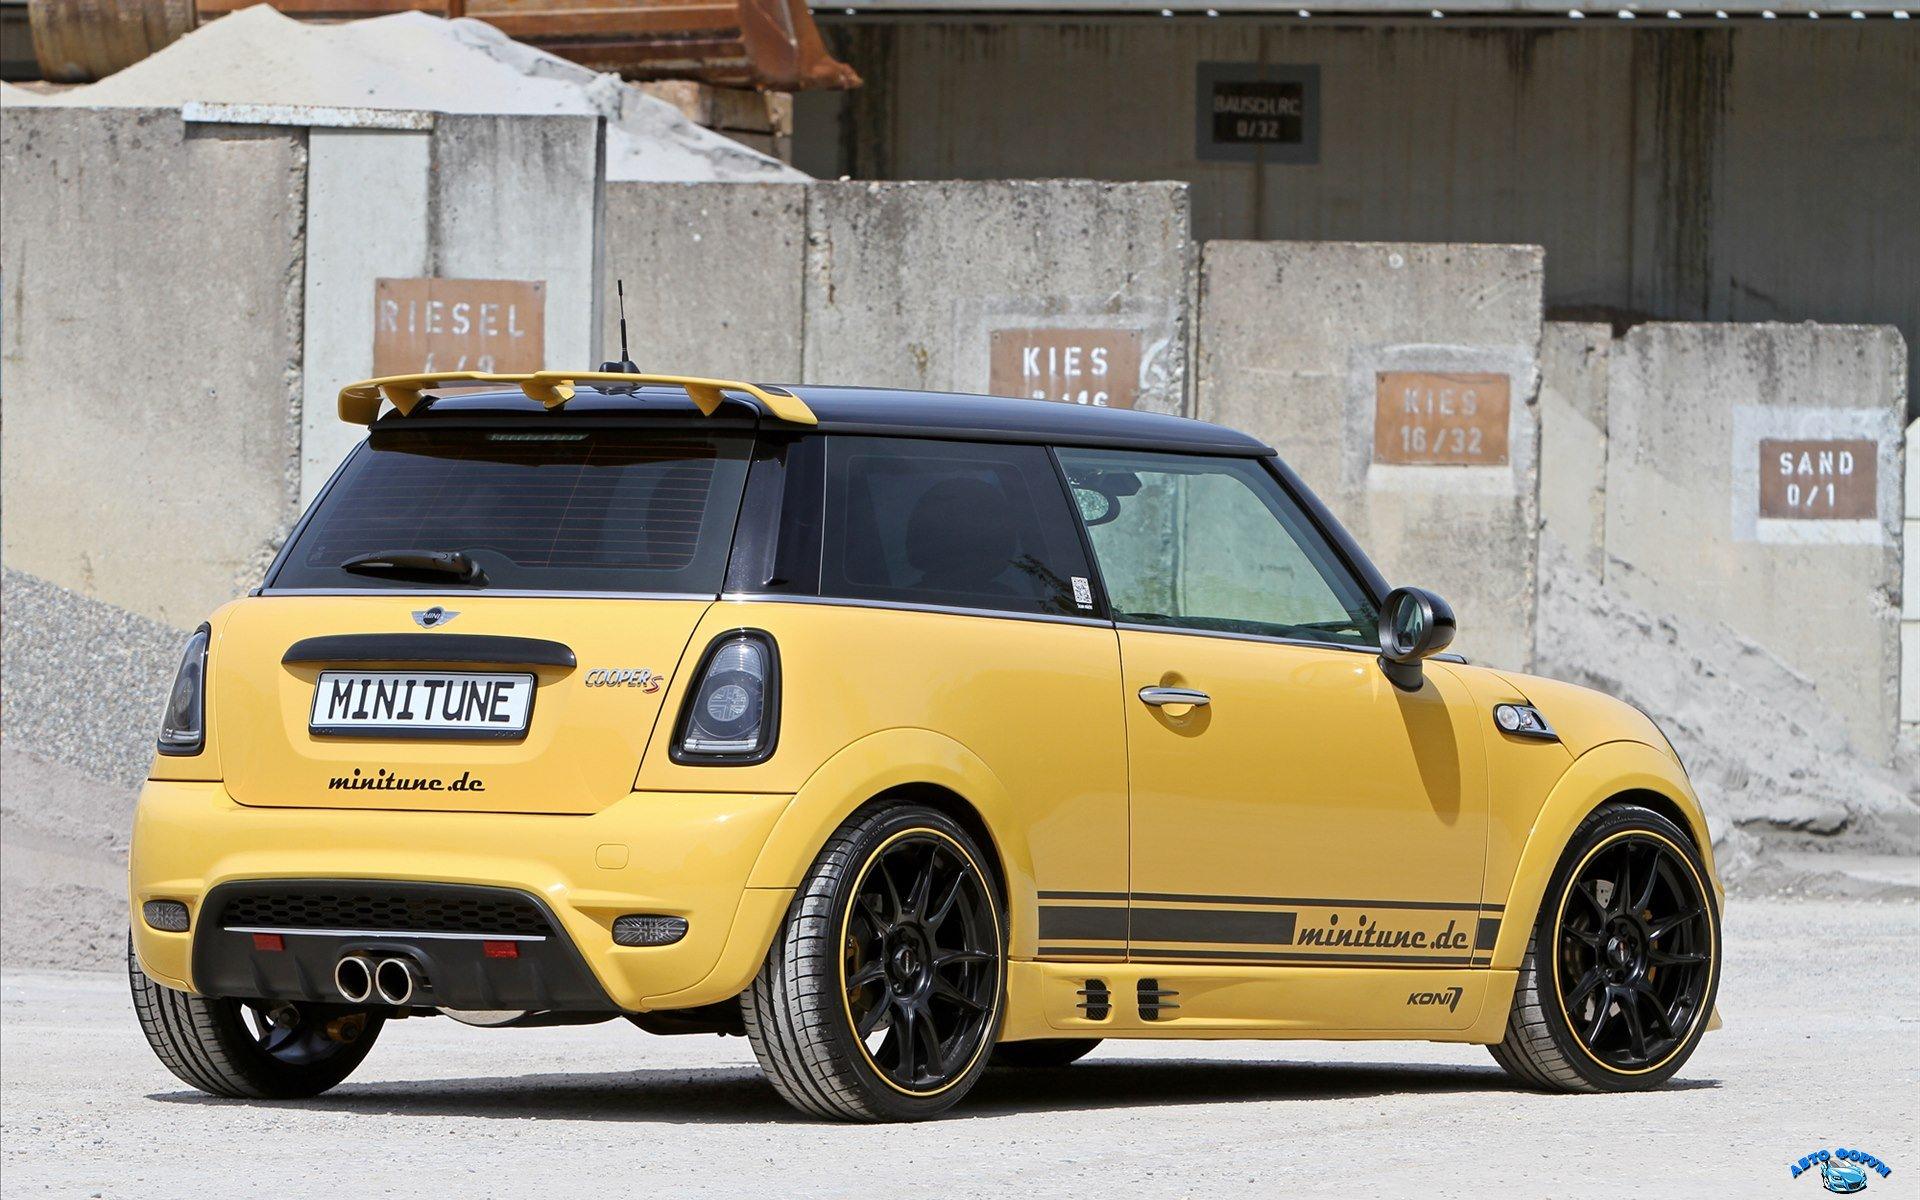 Minitune-MINI-Cooper-S-R56-2014-widescreen-07.jpg